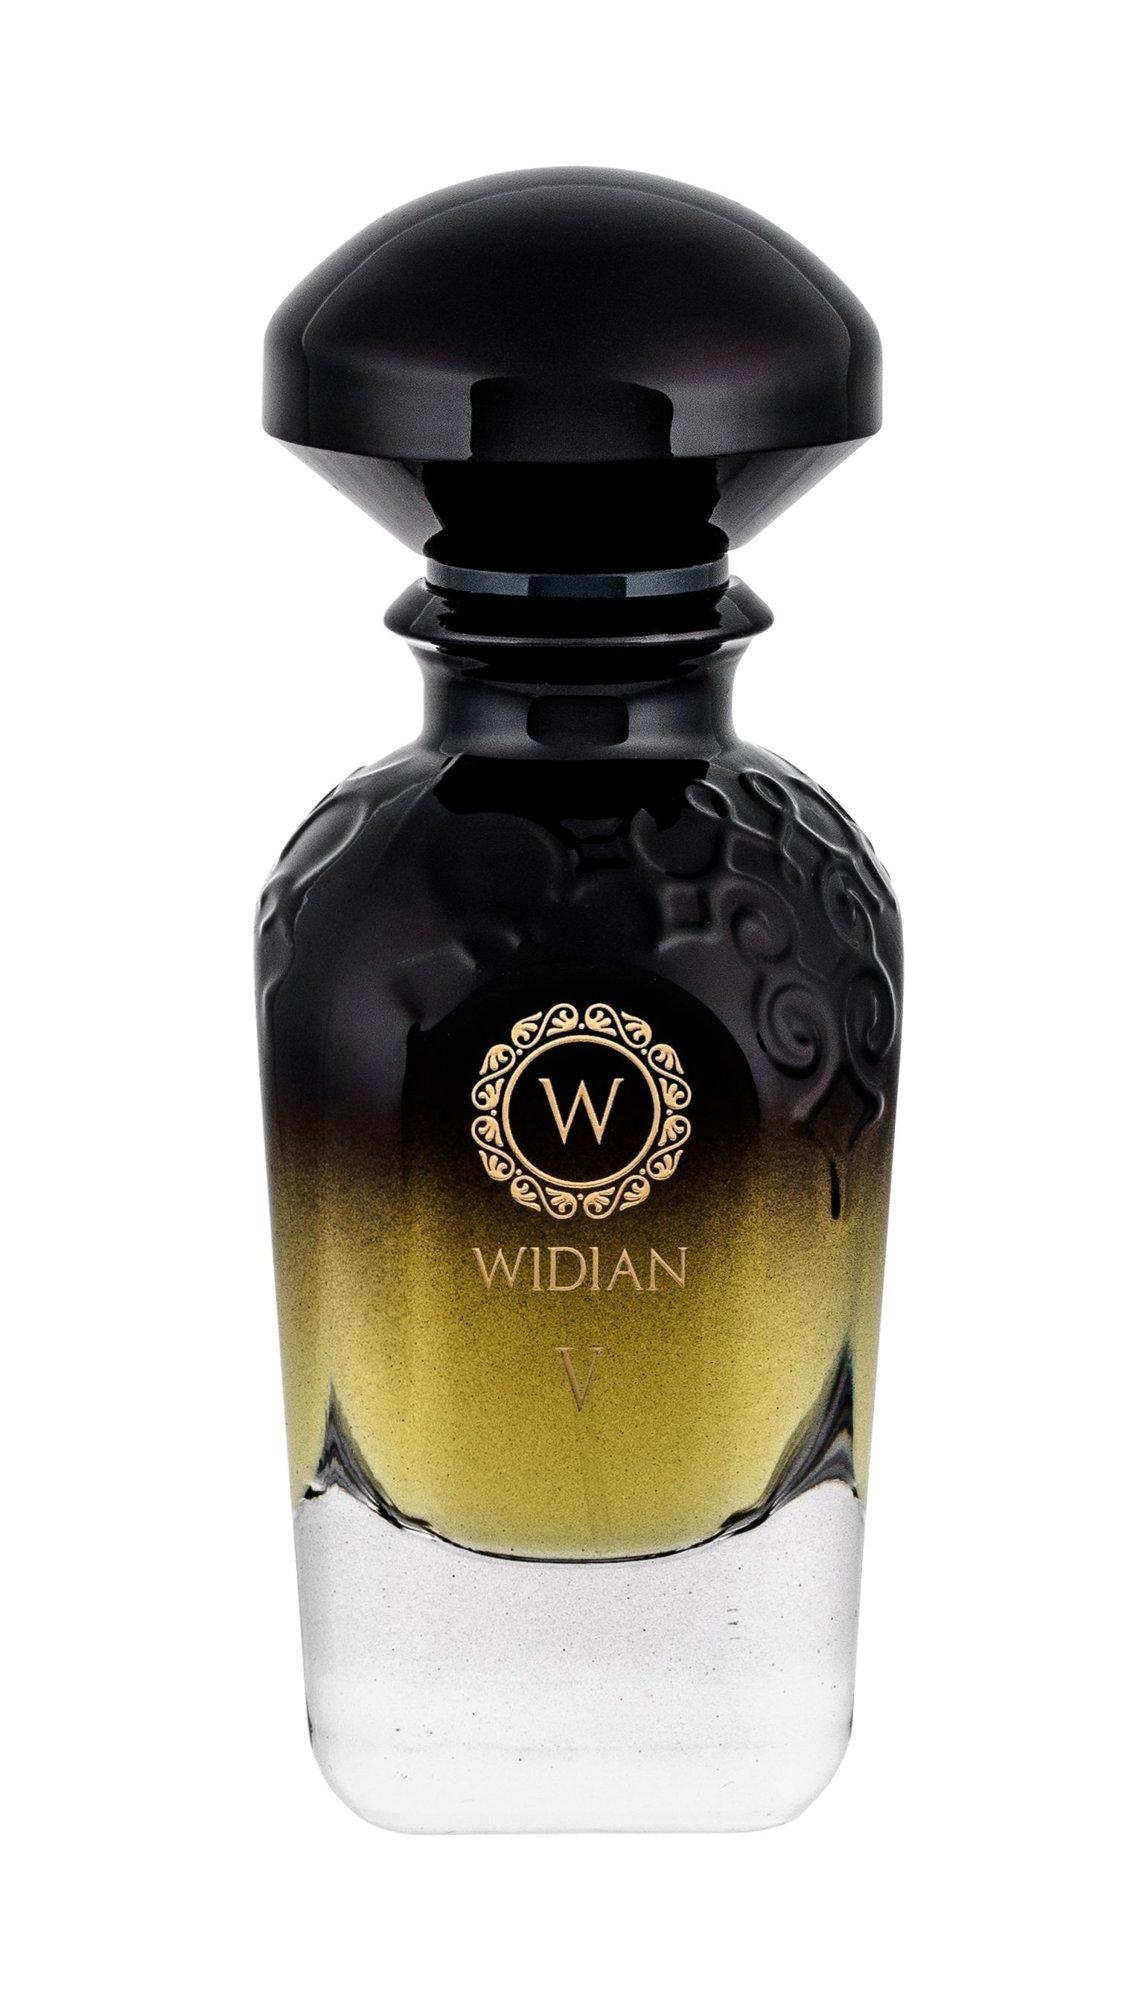 Widian Aj Arabia Black Collection V Perfume 50ml